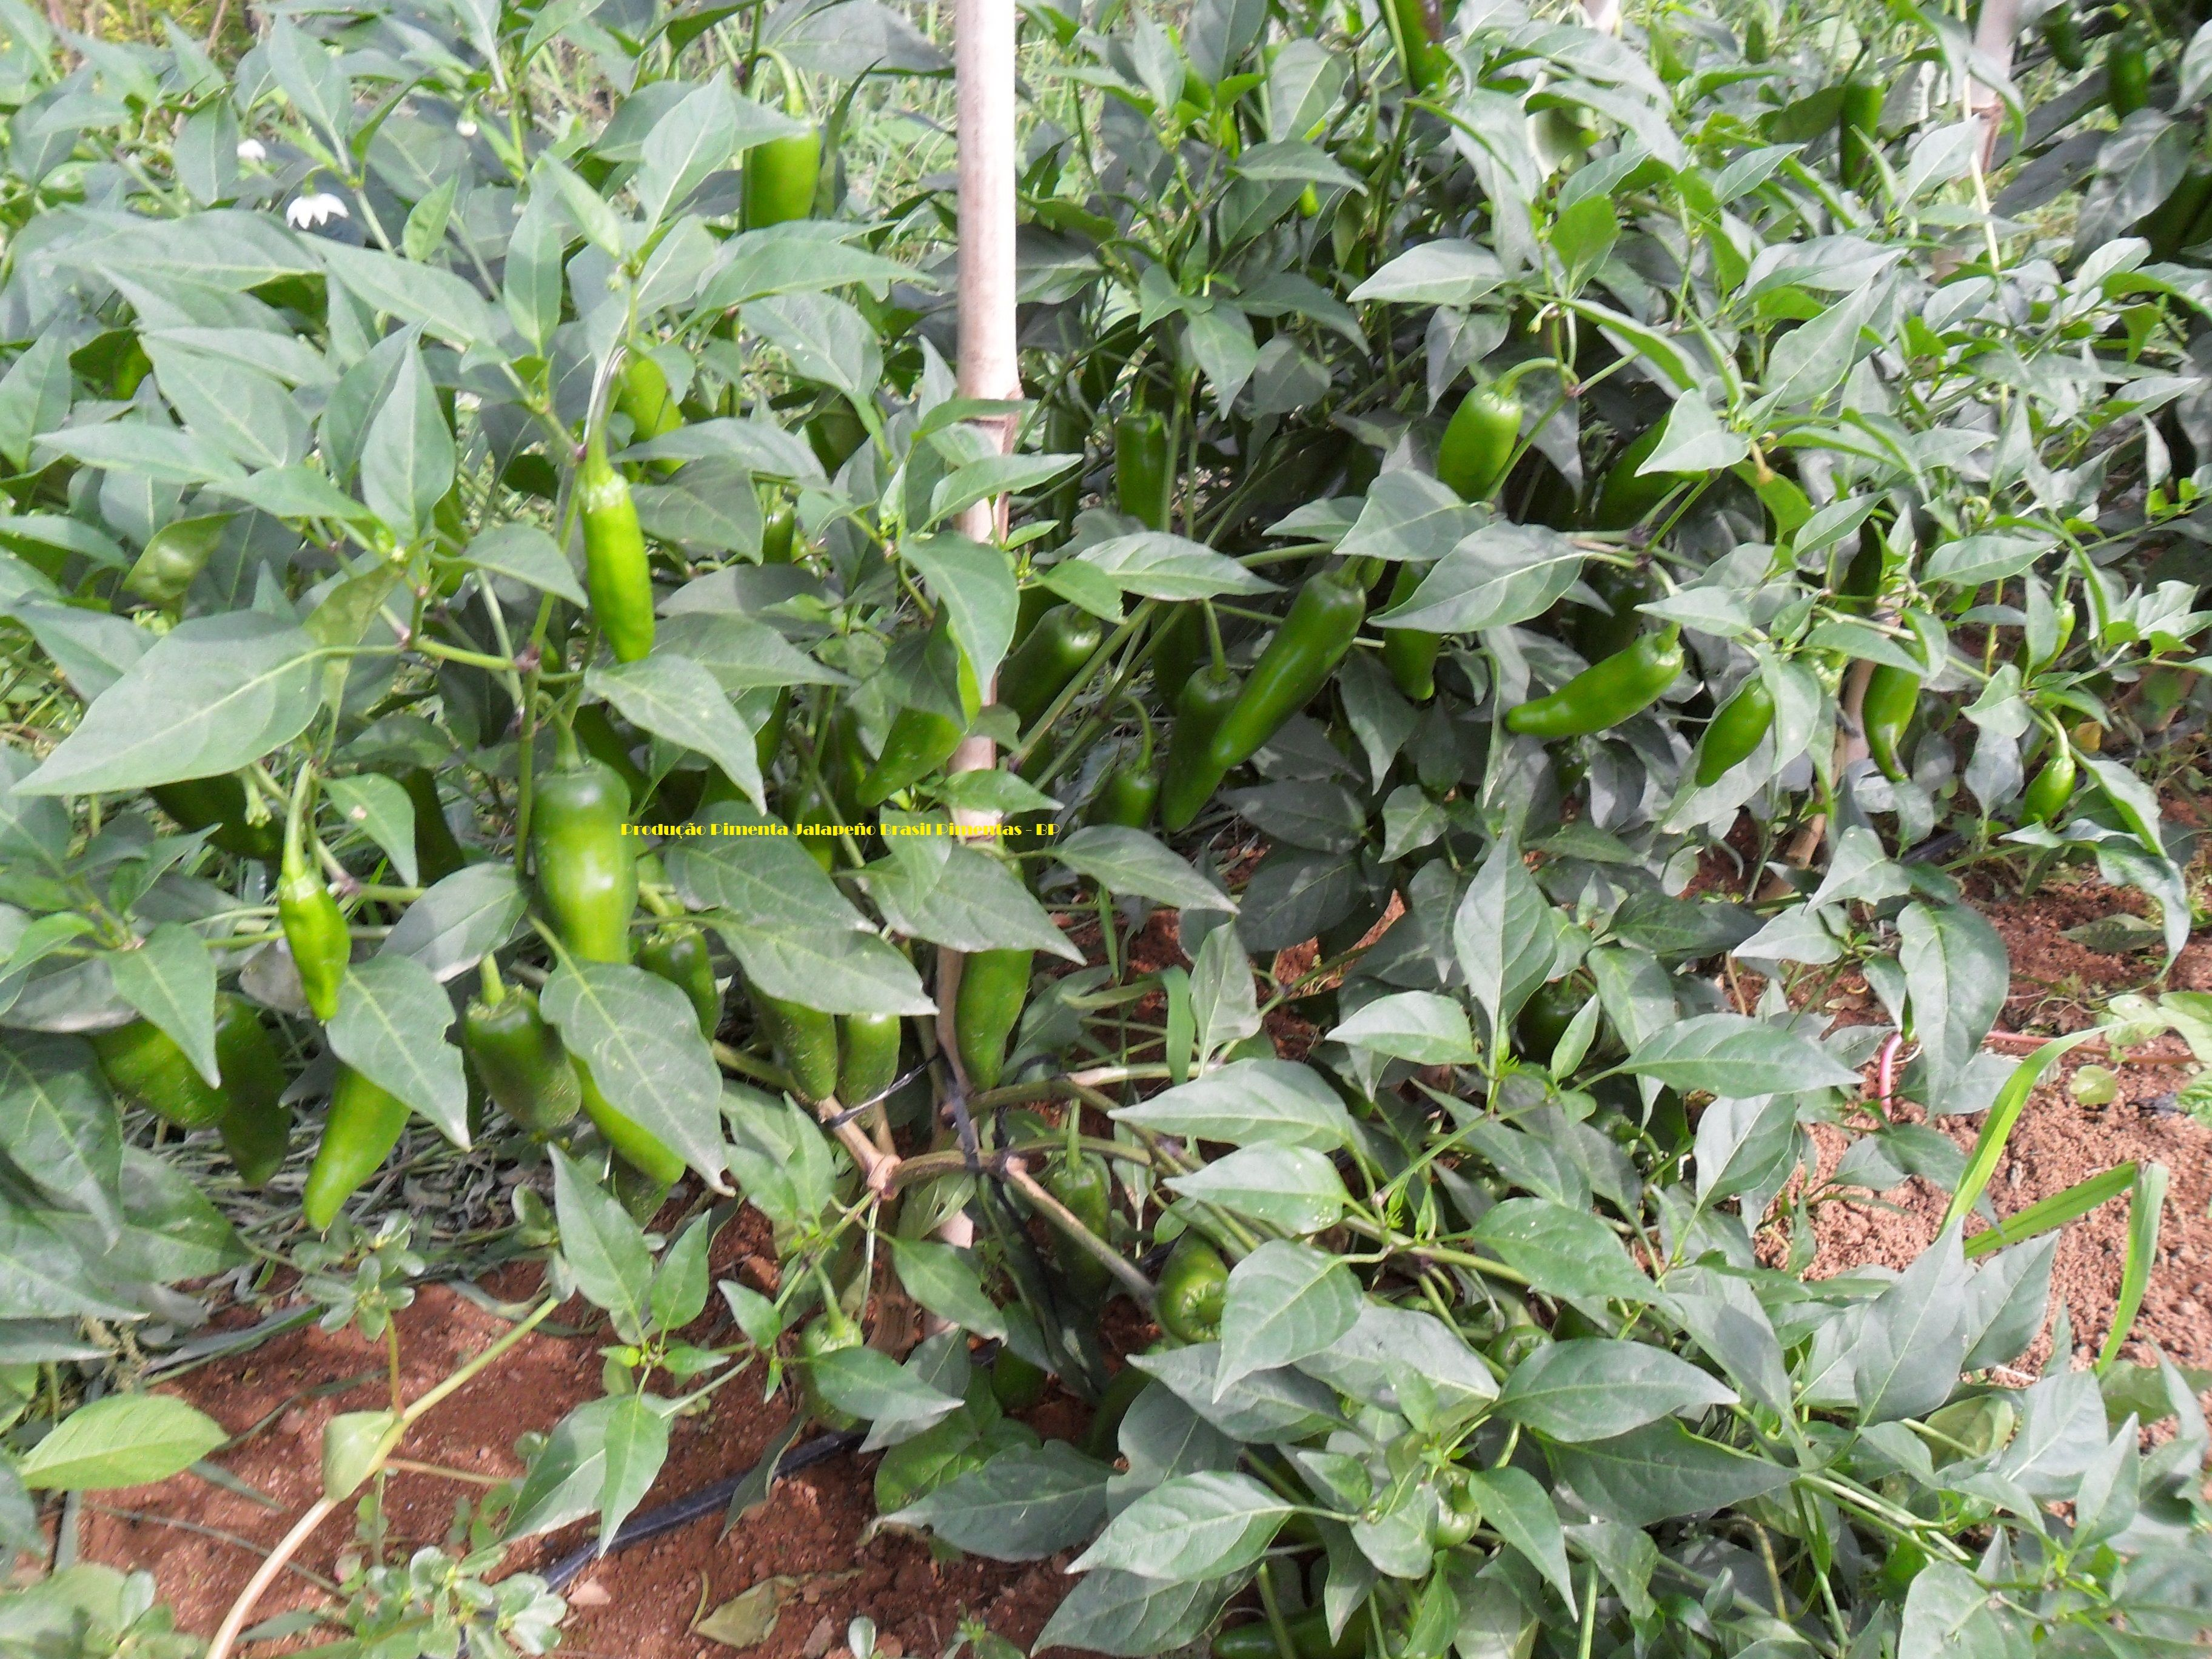 Jalapeno Pepper Plant Production By Brasil Pimentas Com Imagens